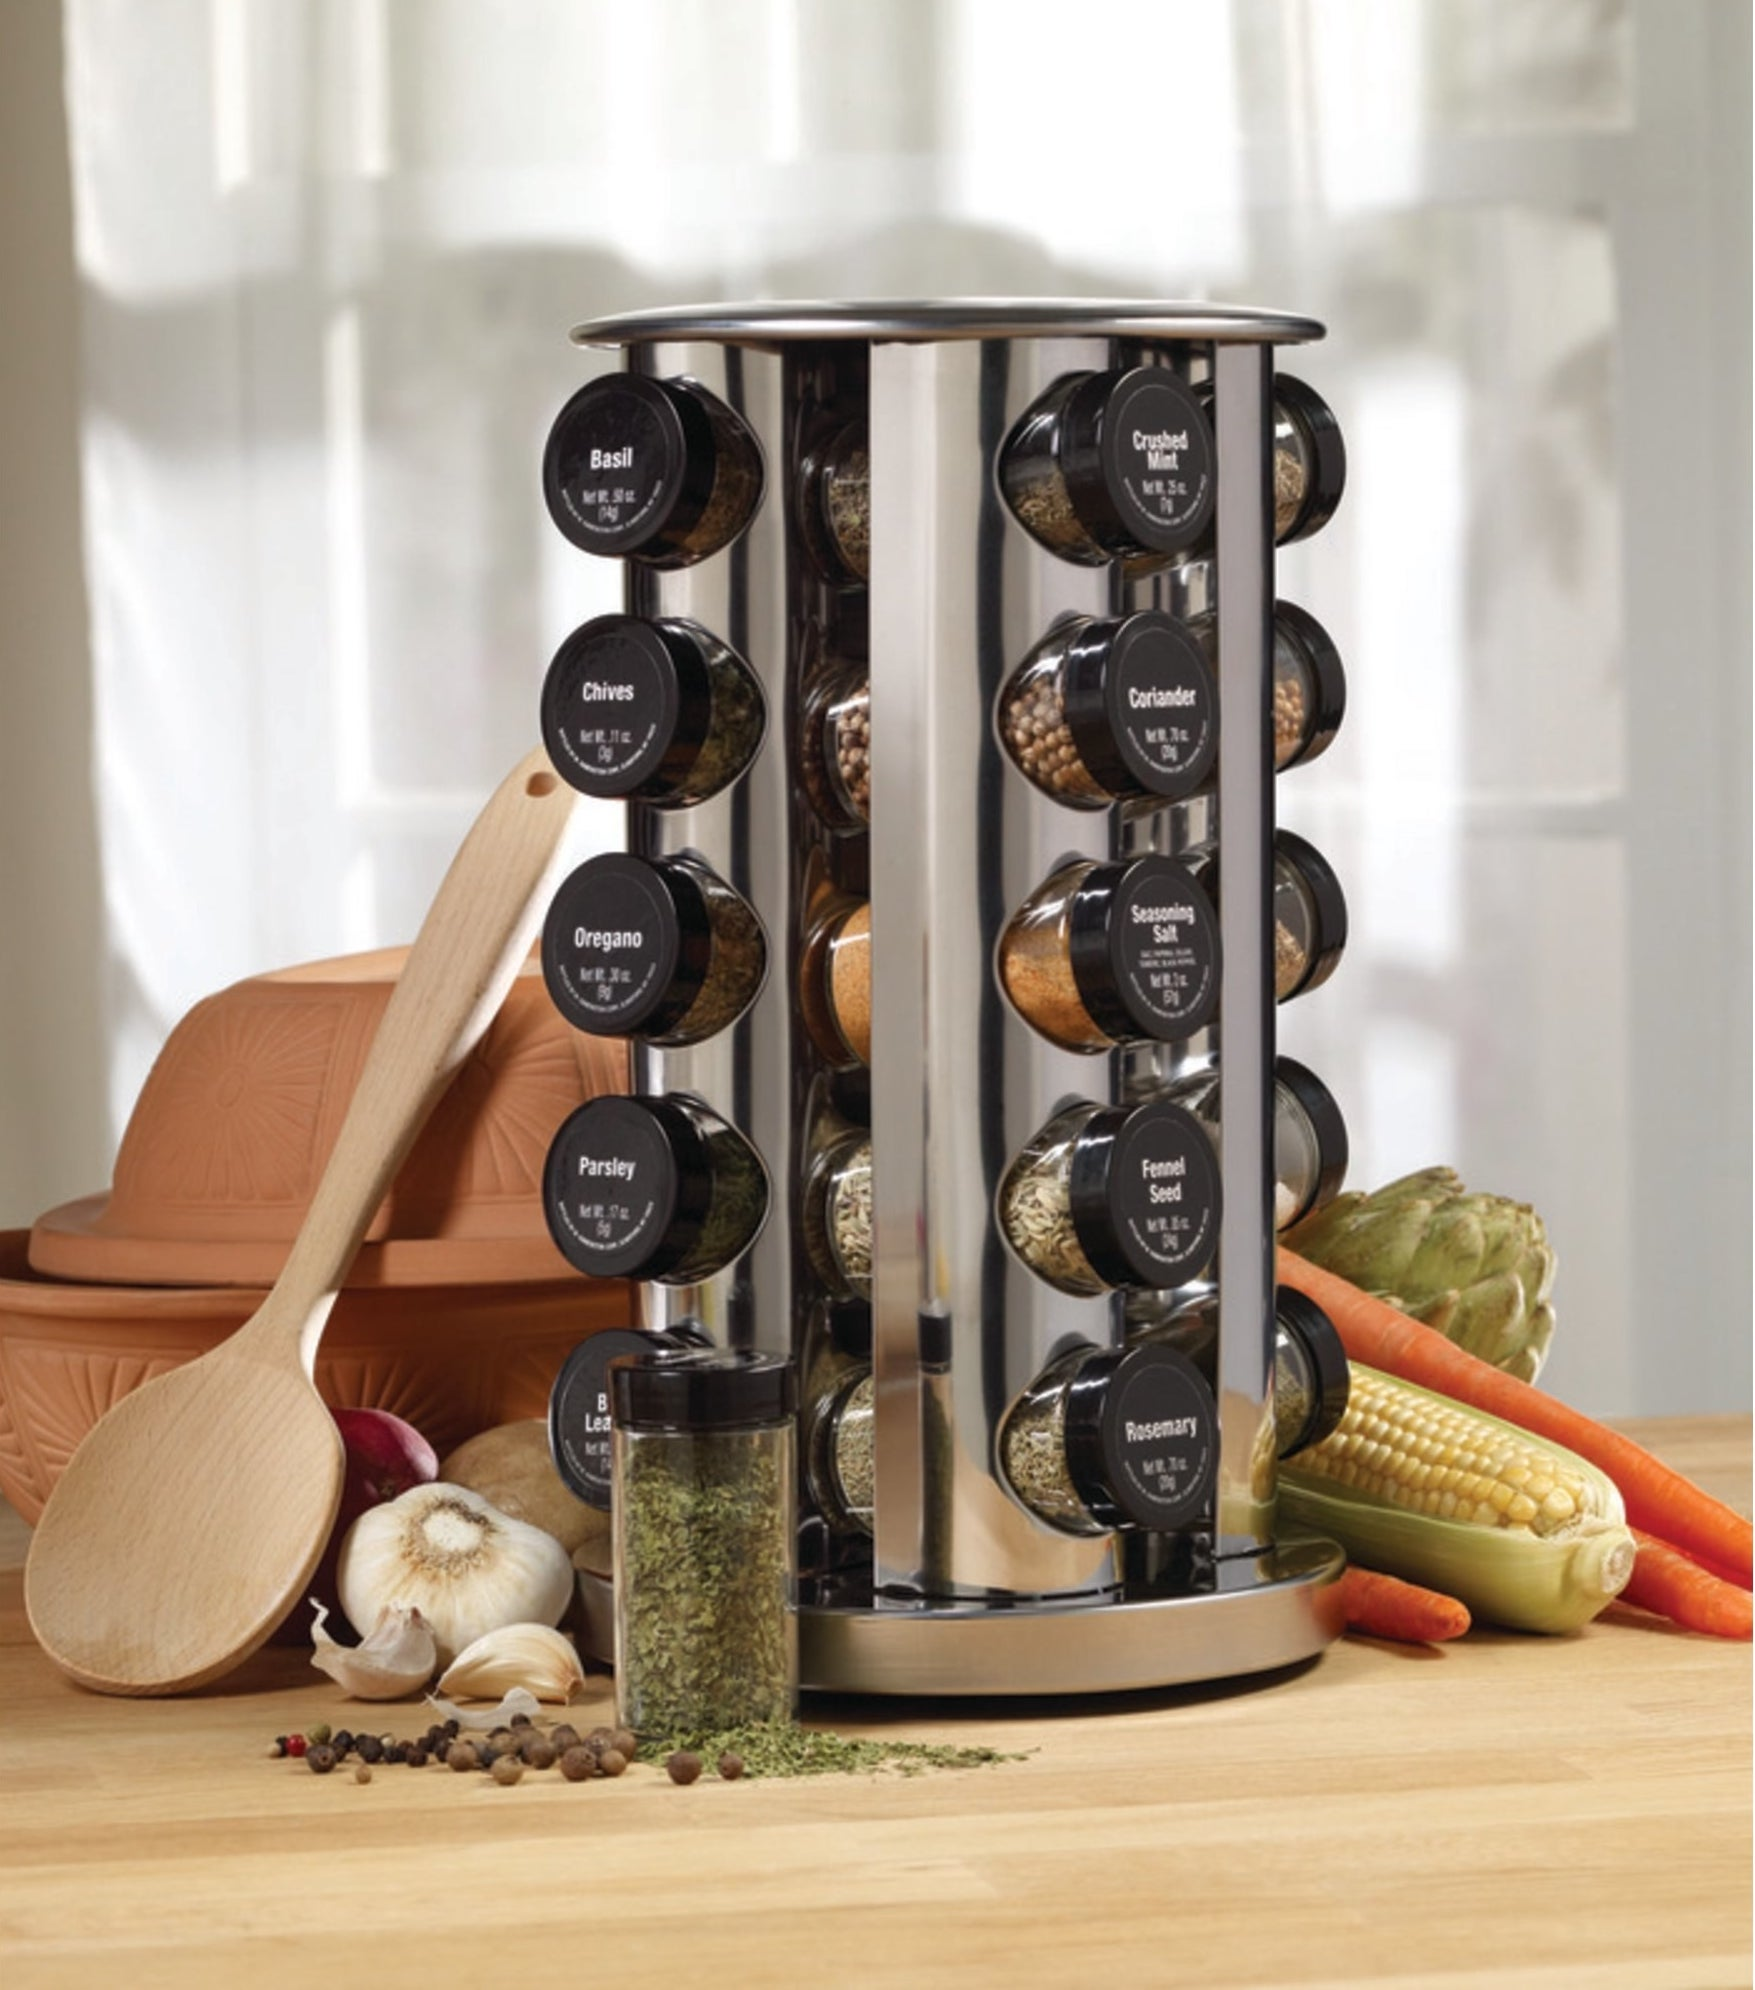 the spice jar rack